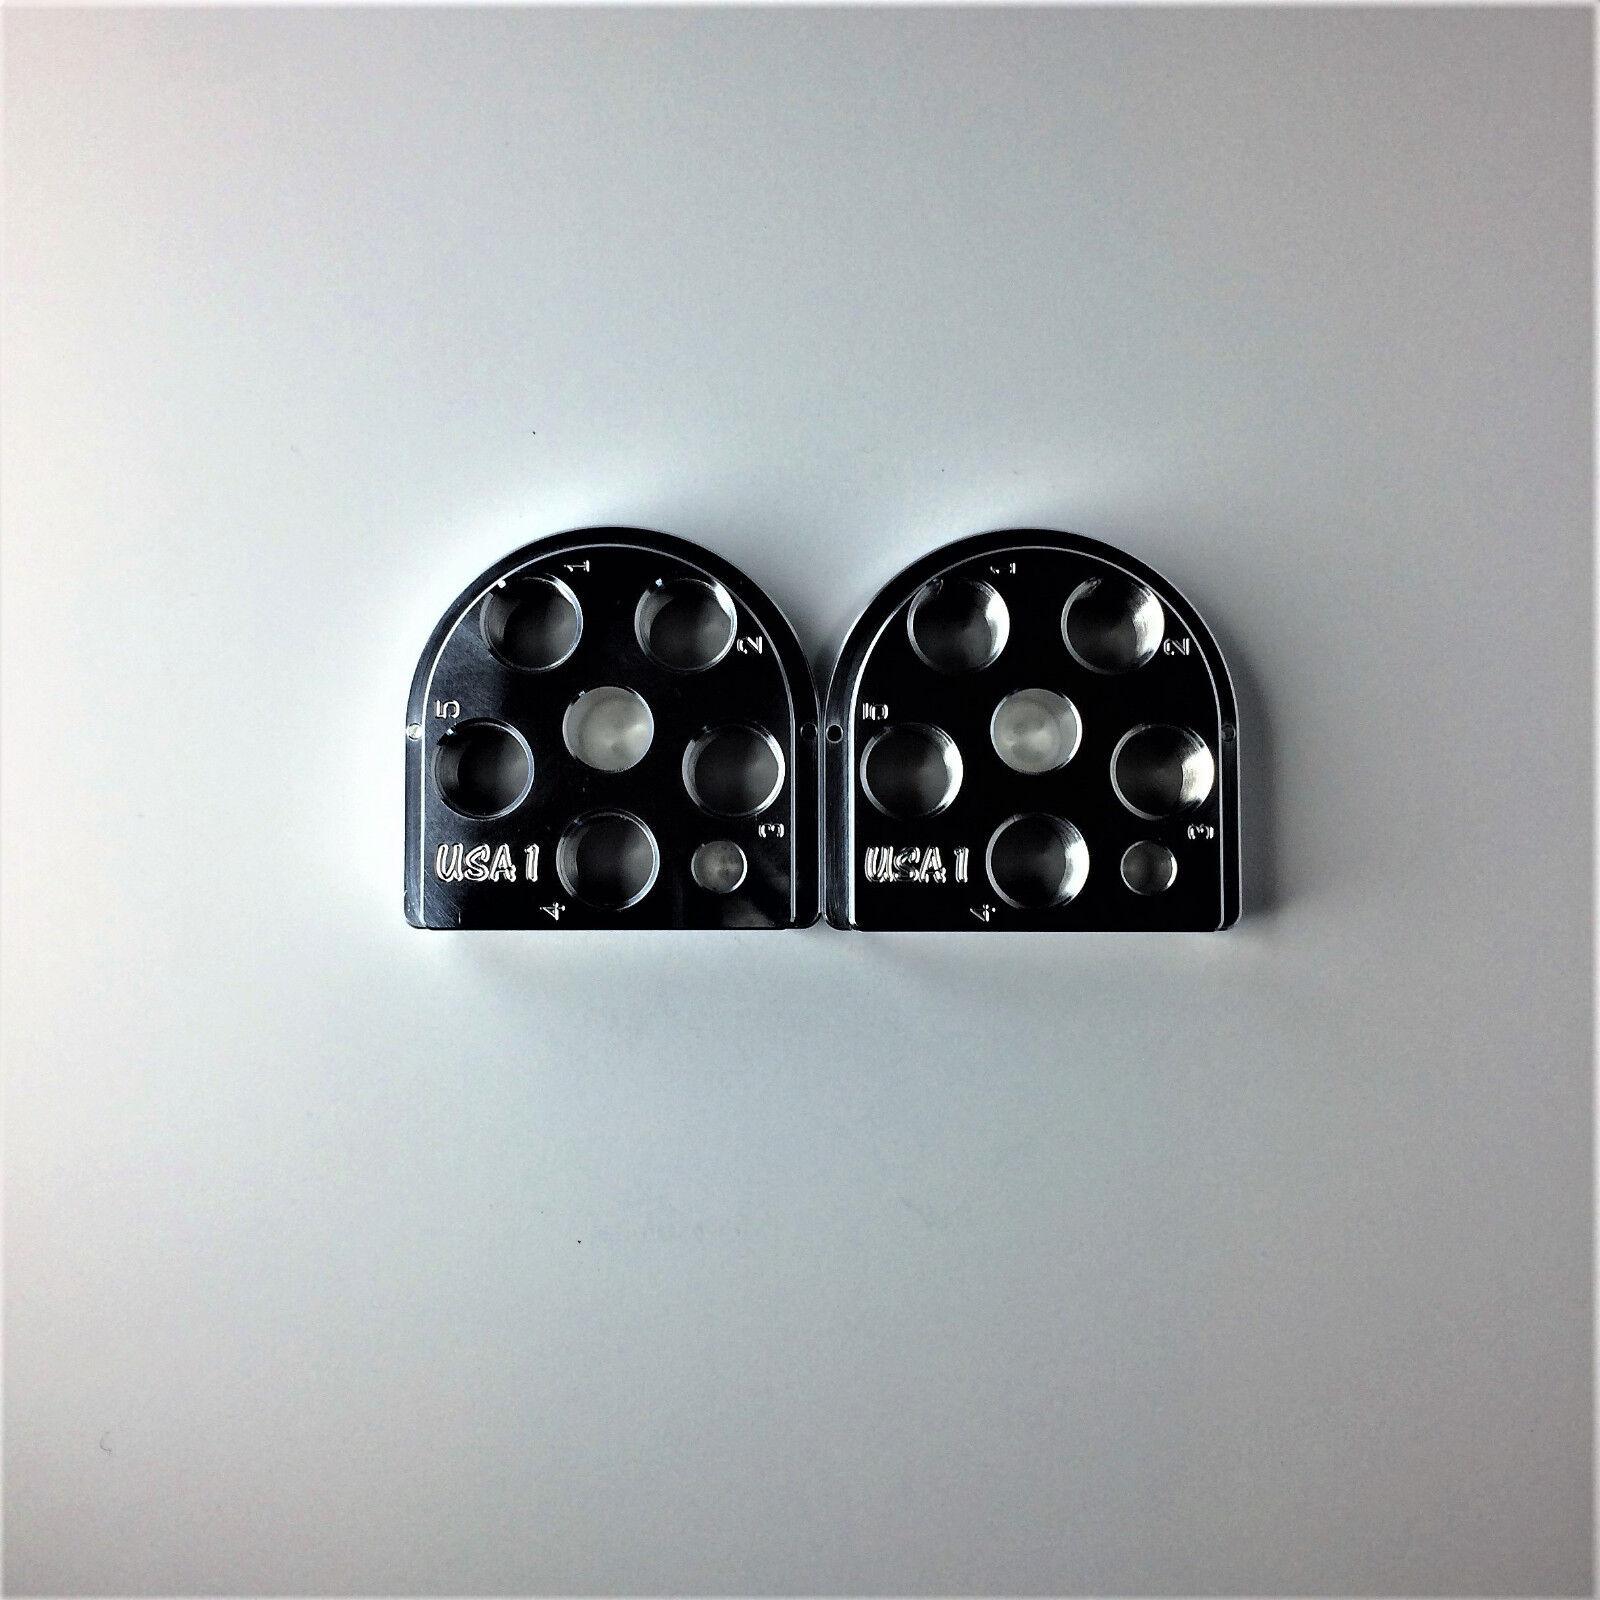 (2) Dillon Precision XL650 Style Billet Aluminum Toolhead 5 Station tool head